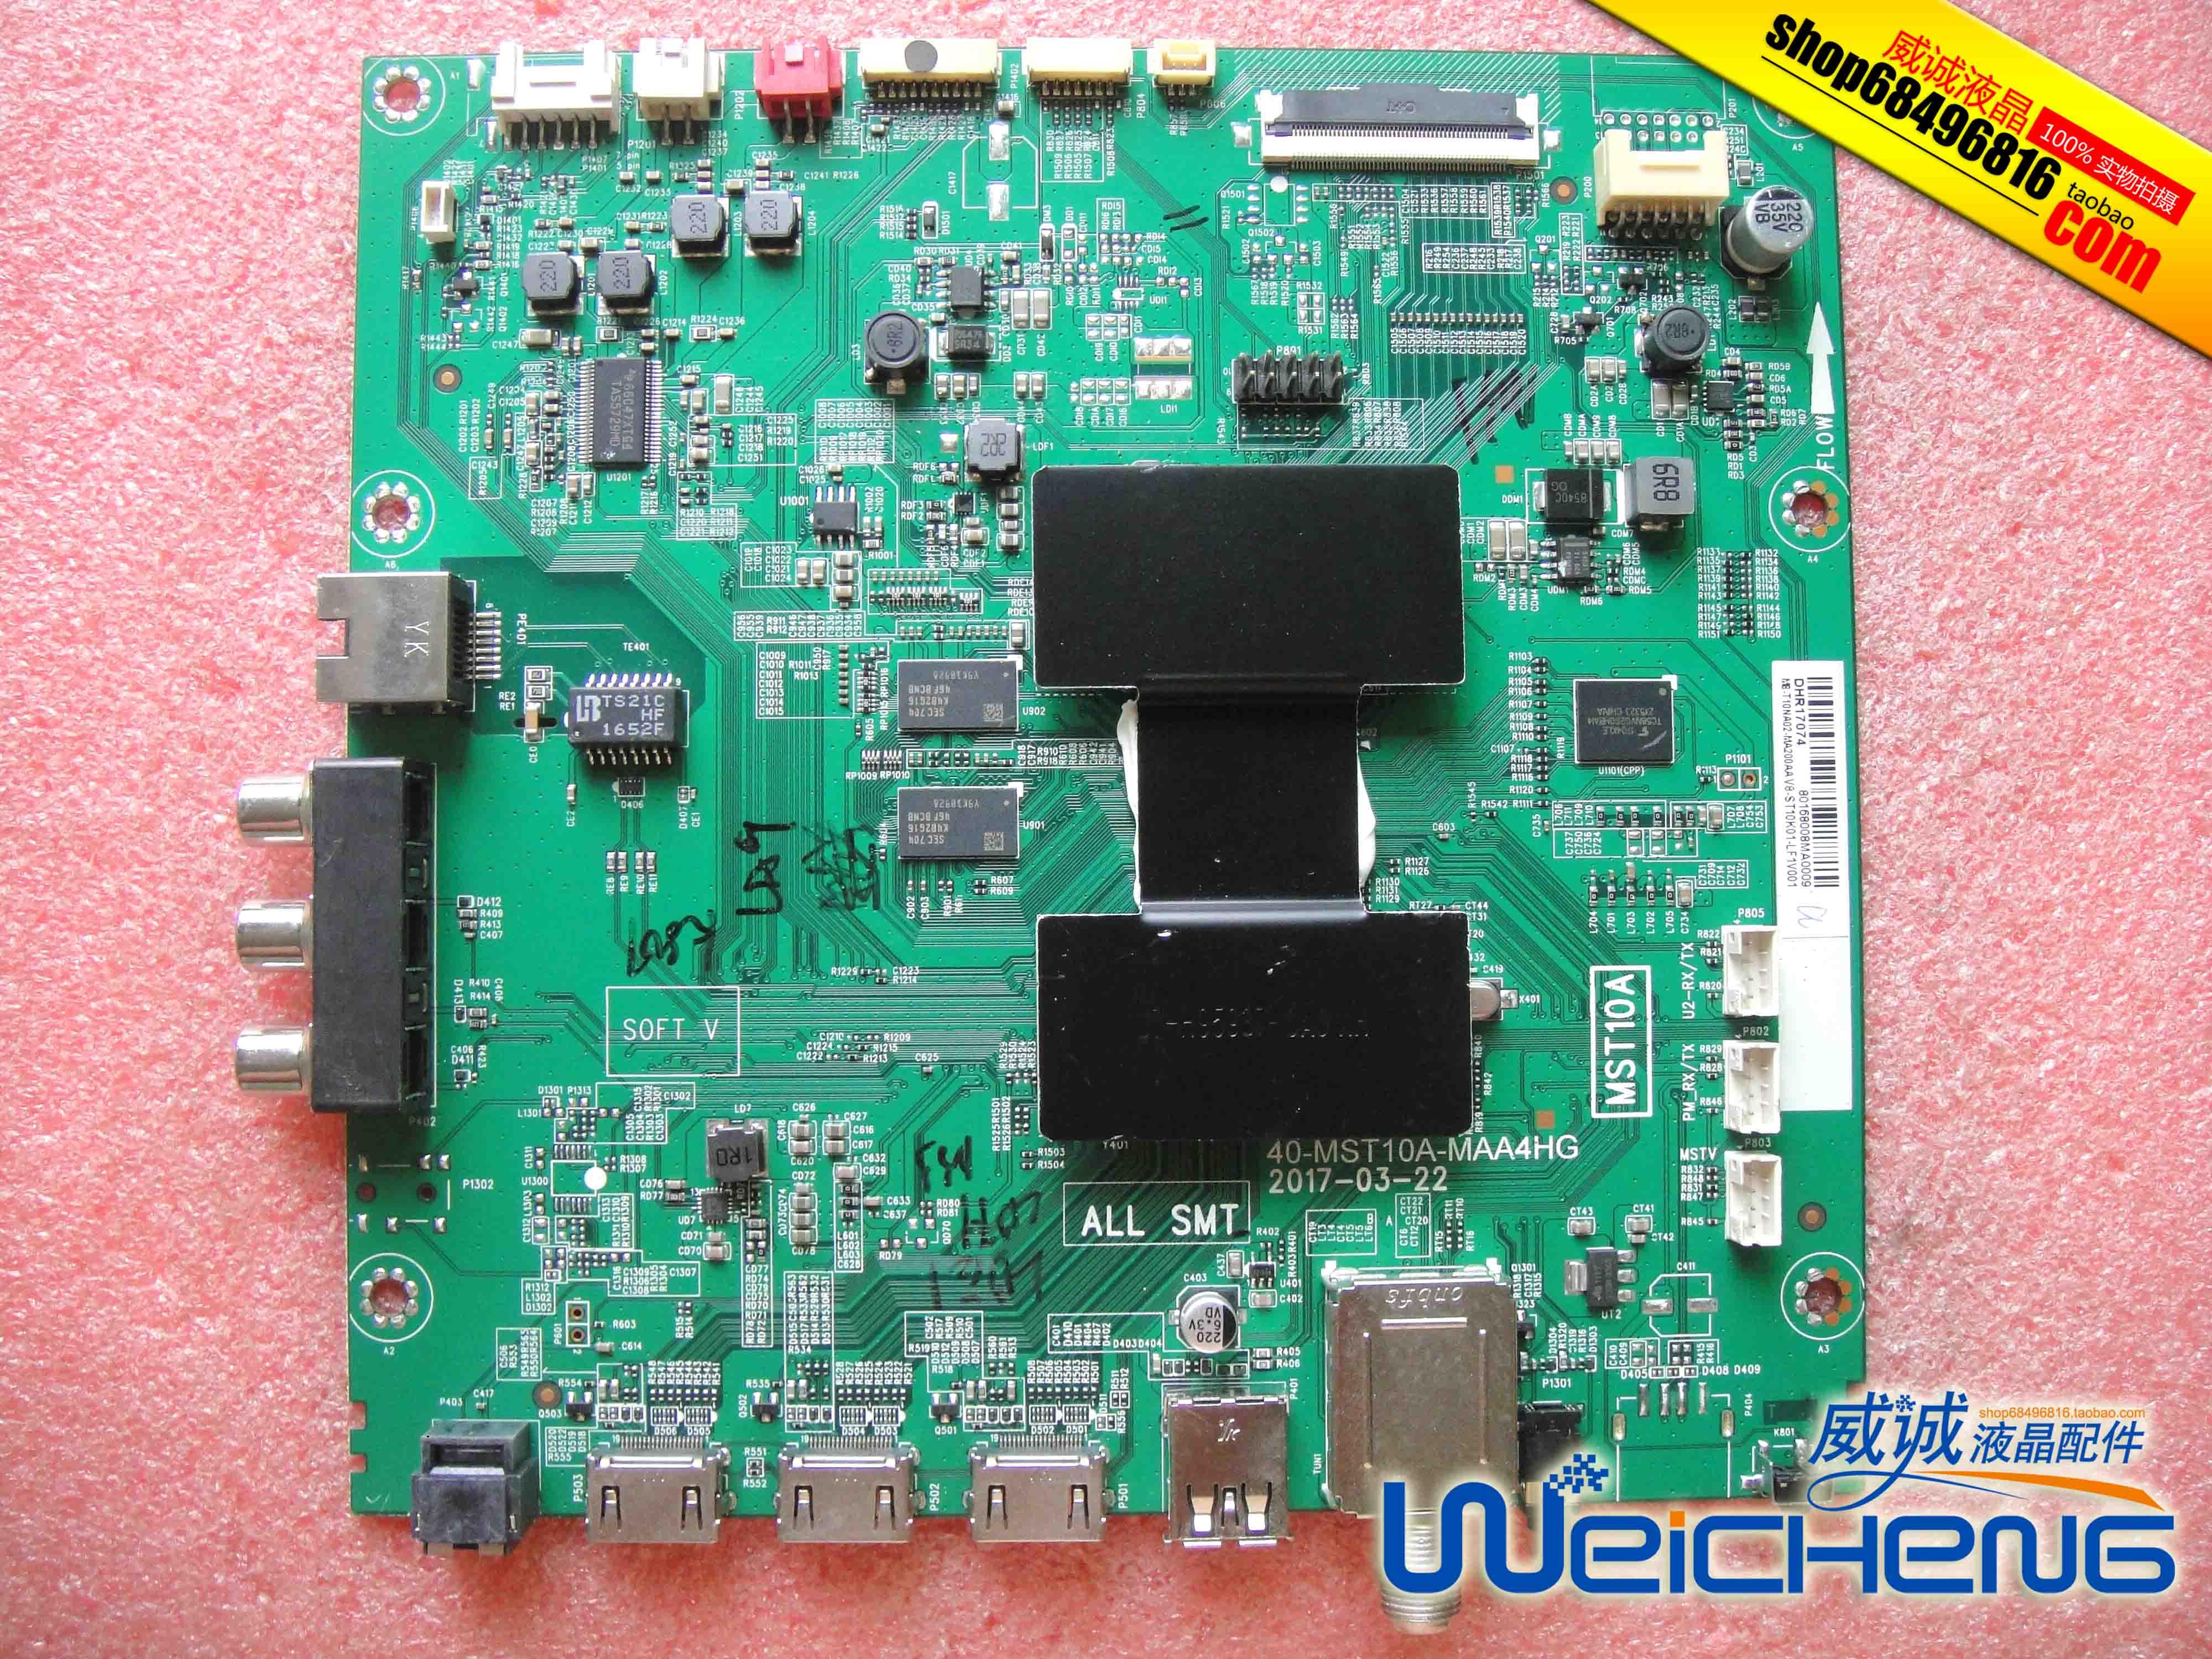 40-MST10A-MAA4HG DHR17074 V8-ST10K01-LF1V001